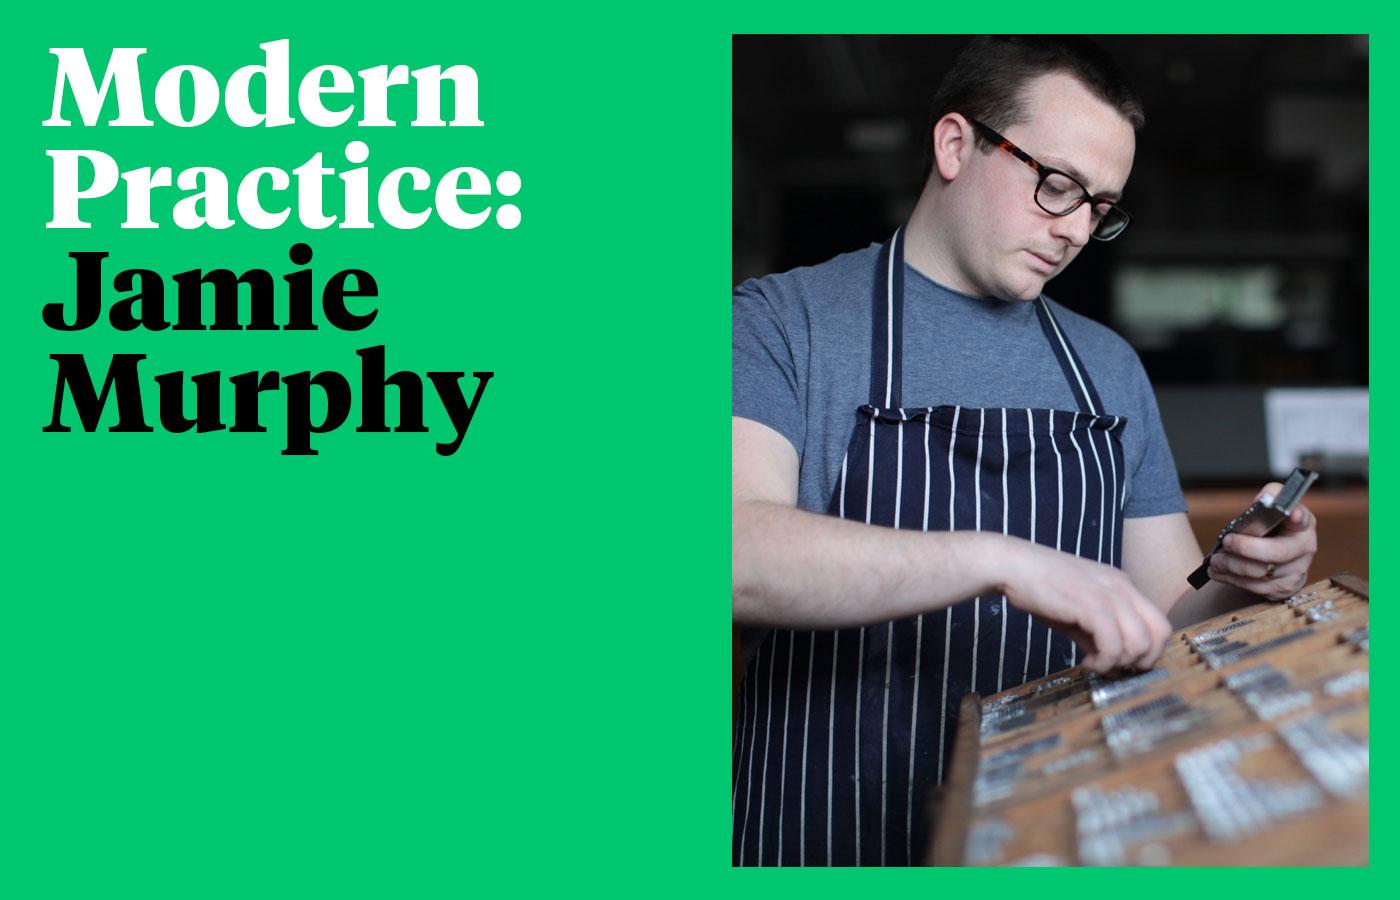 Cover image: Modern Practice - Jamie Murphy